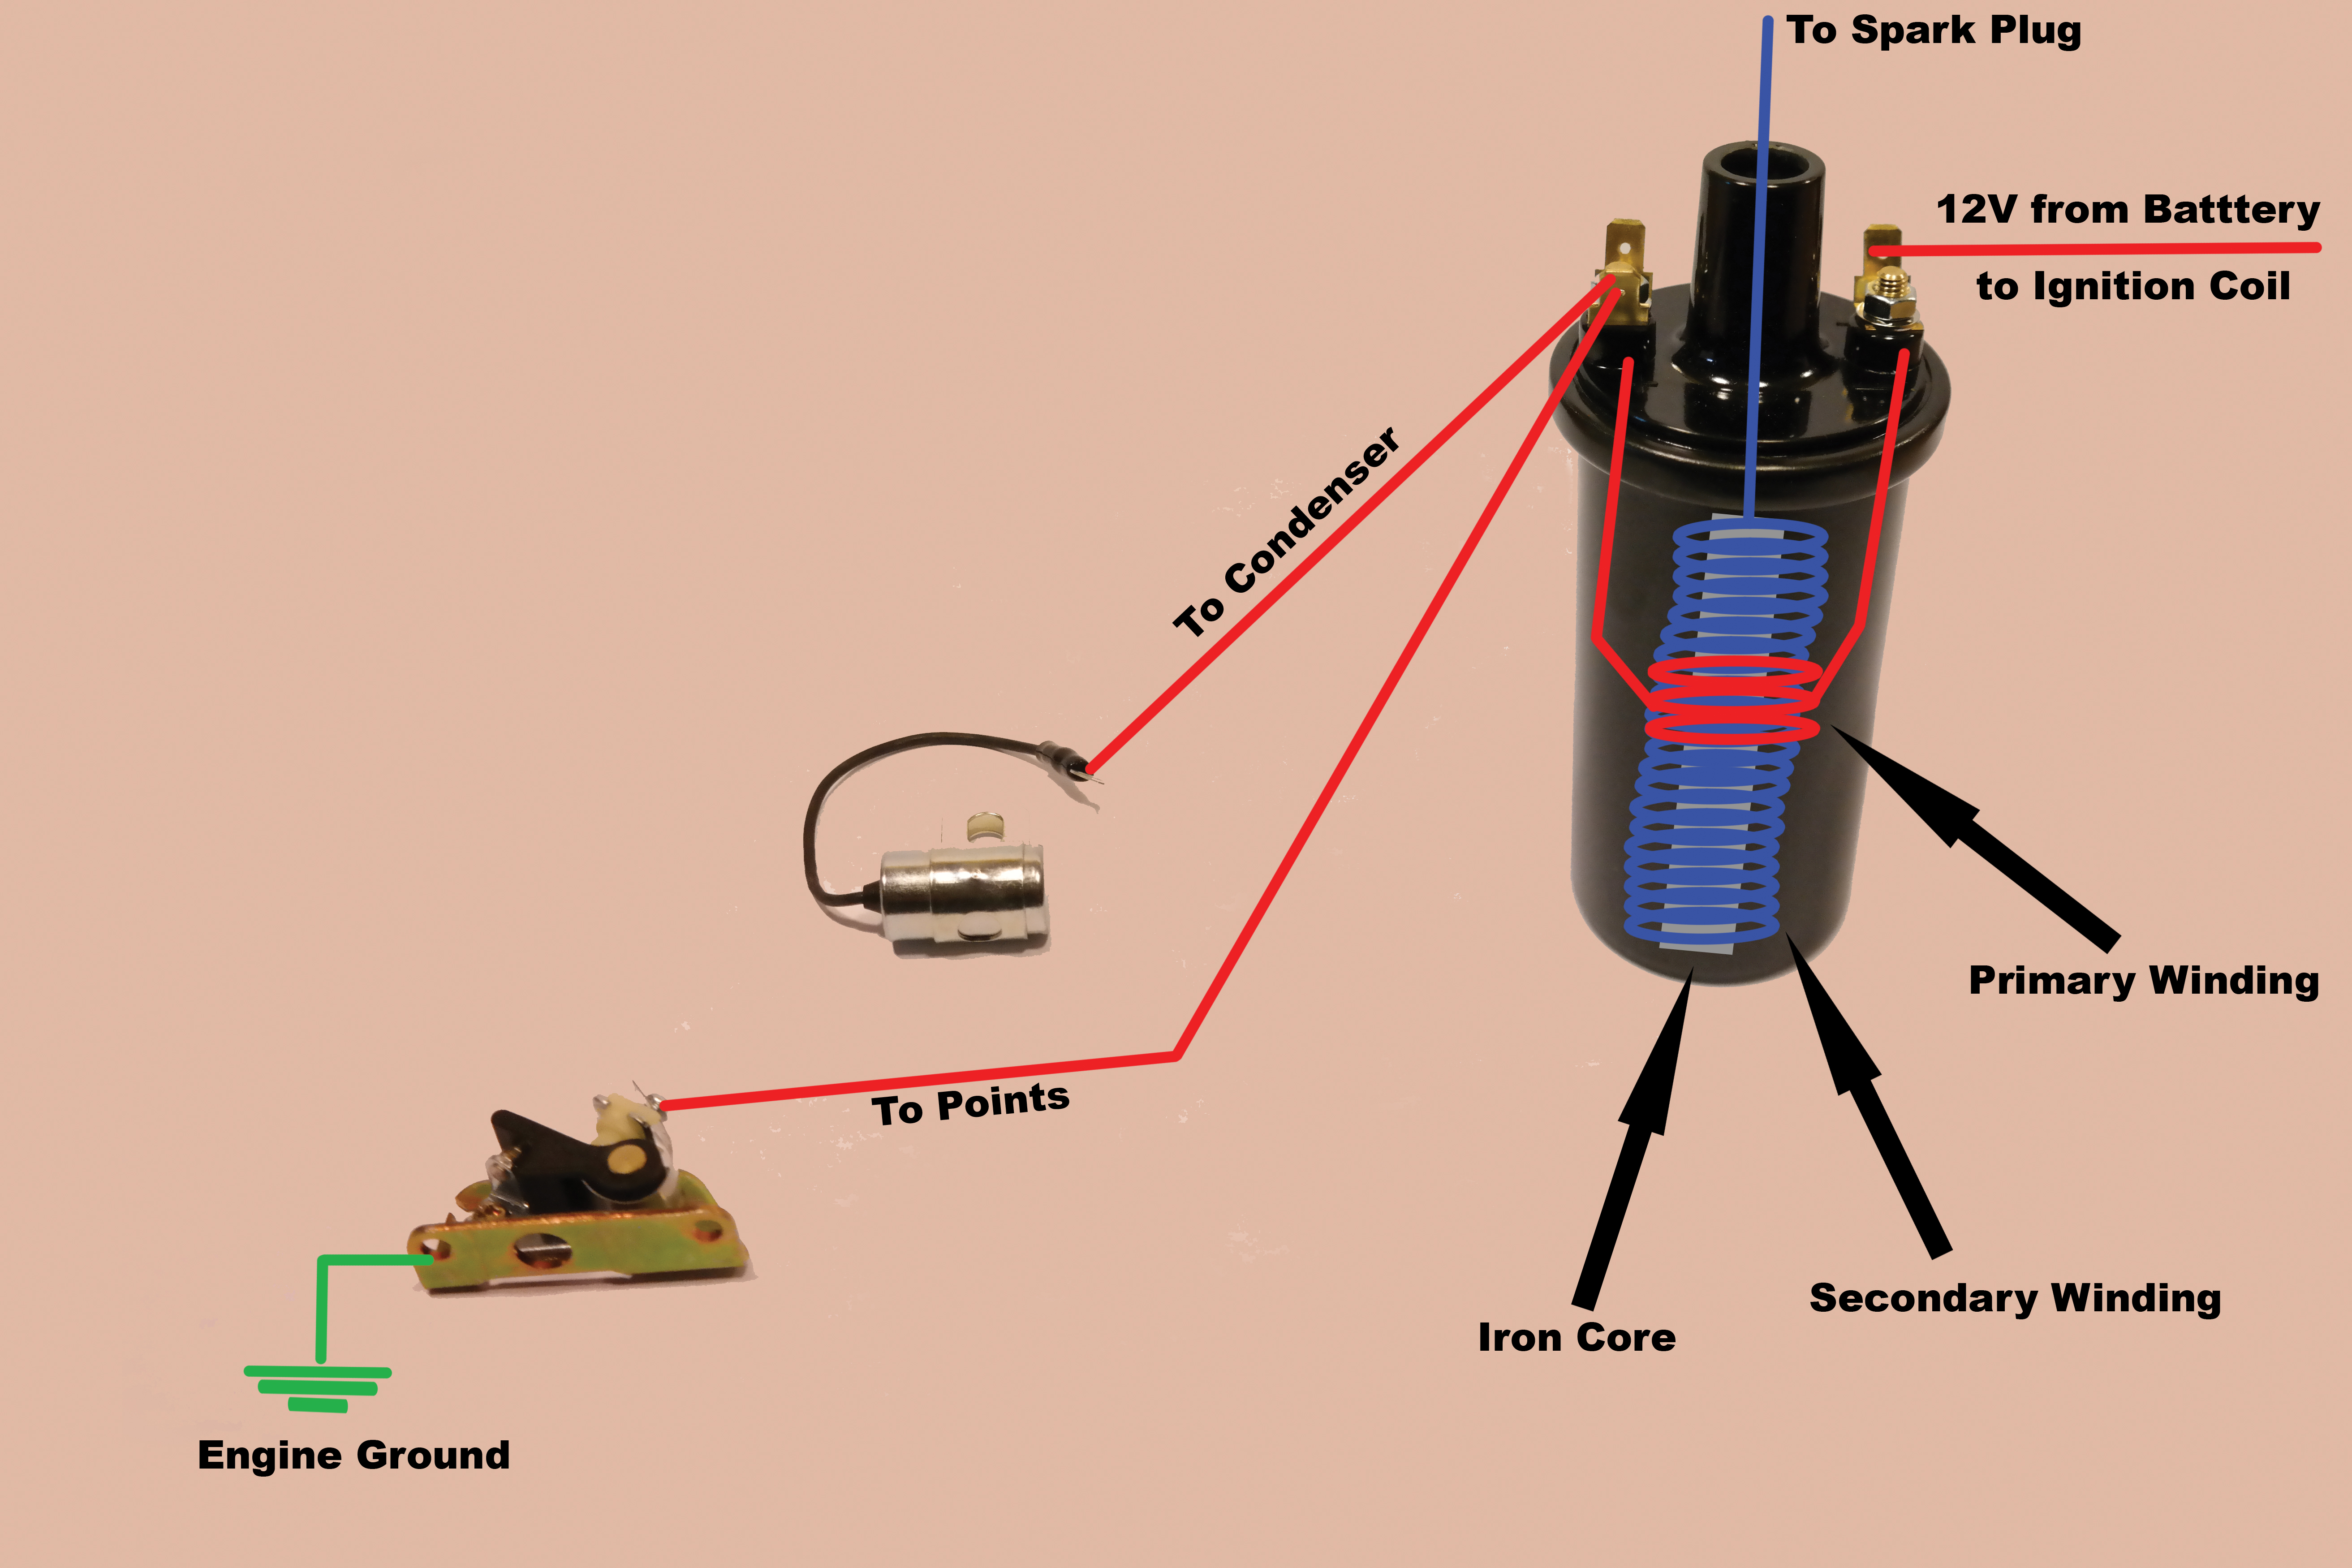 Understanding Your Battery Ignition System On Your Kohler